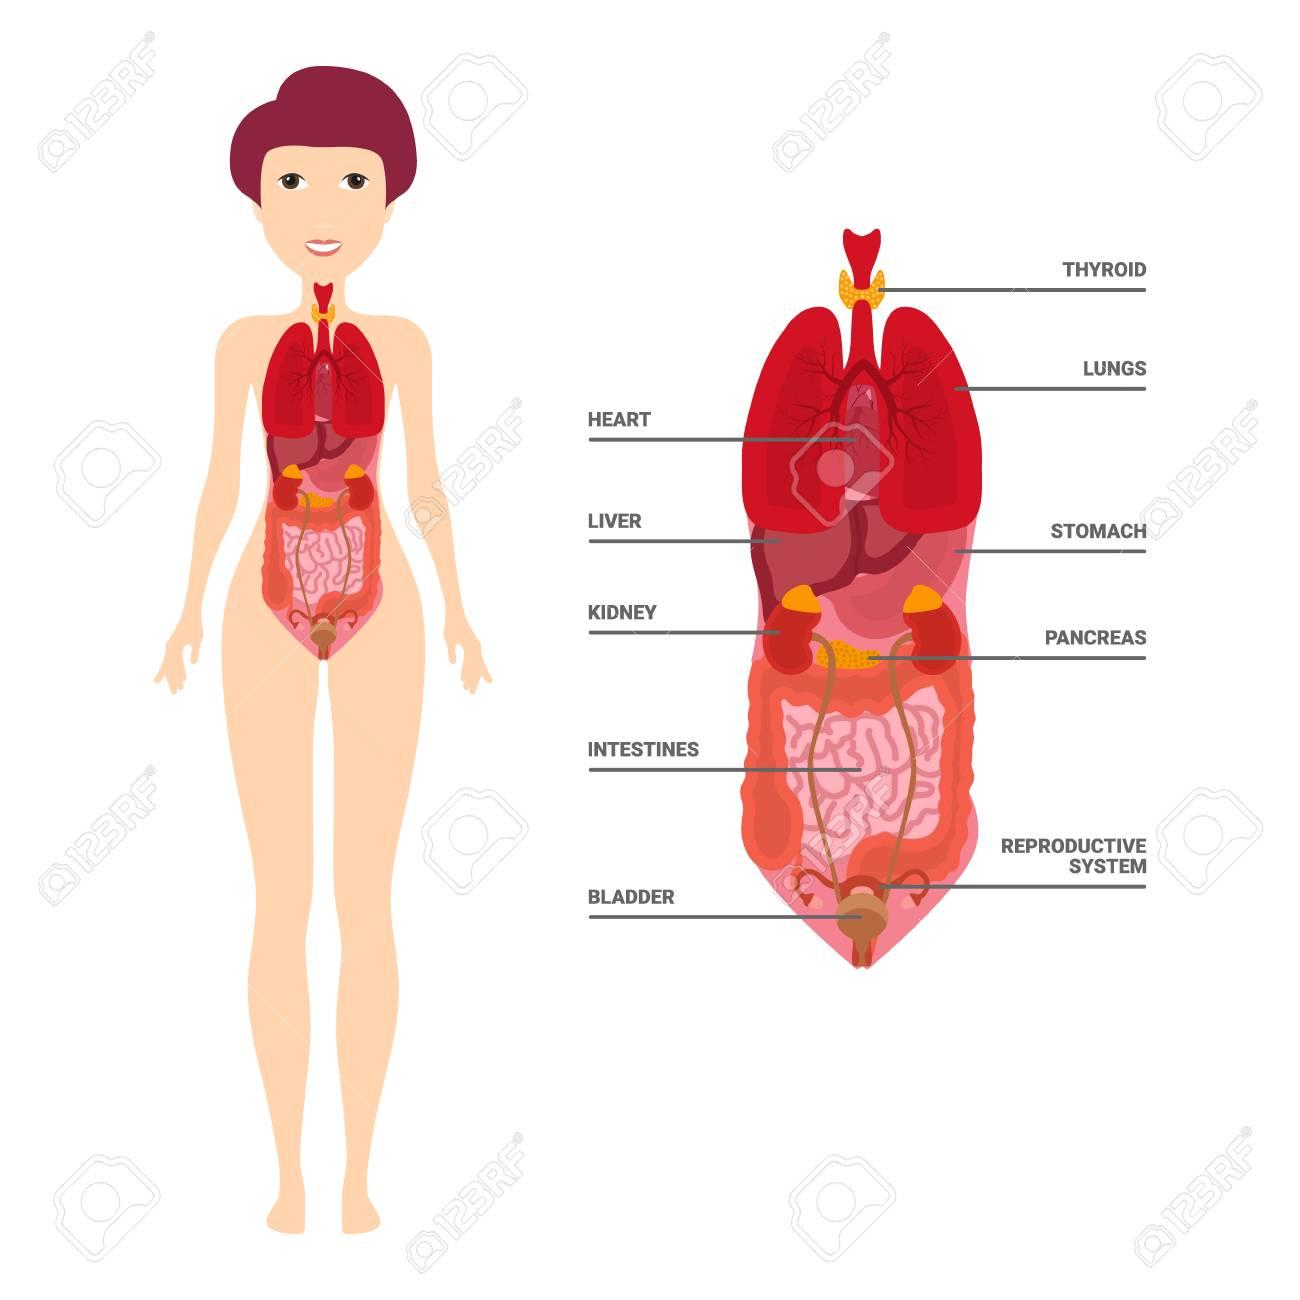 Female Human Anatomy Internal Organs Diagram Physiology Structure